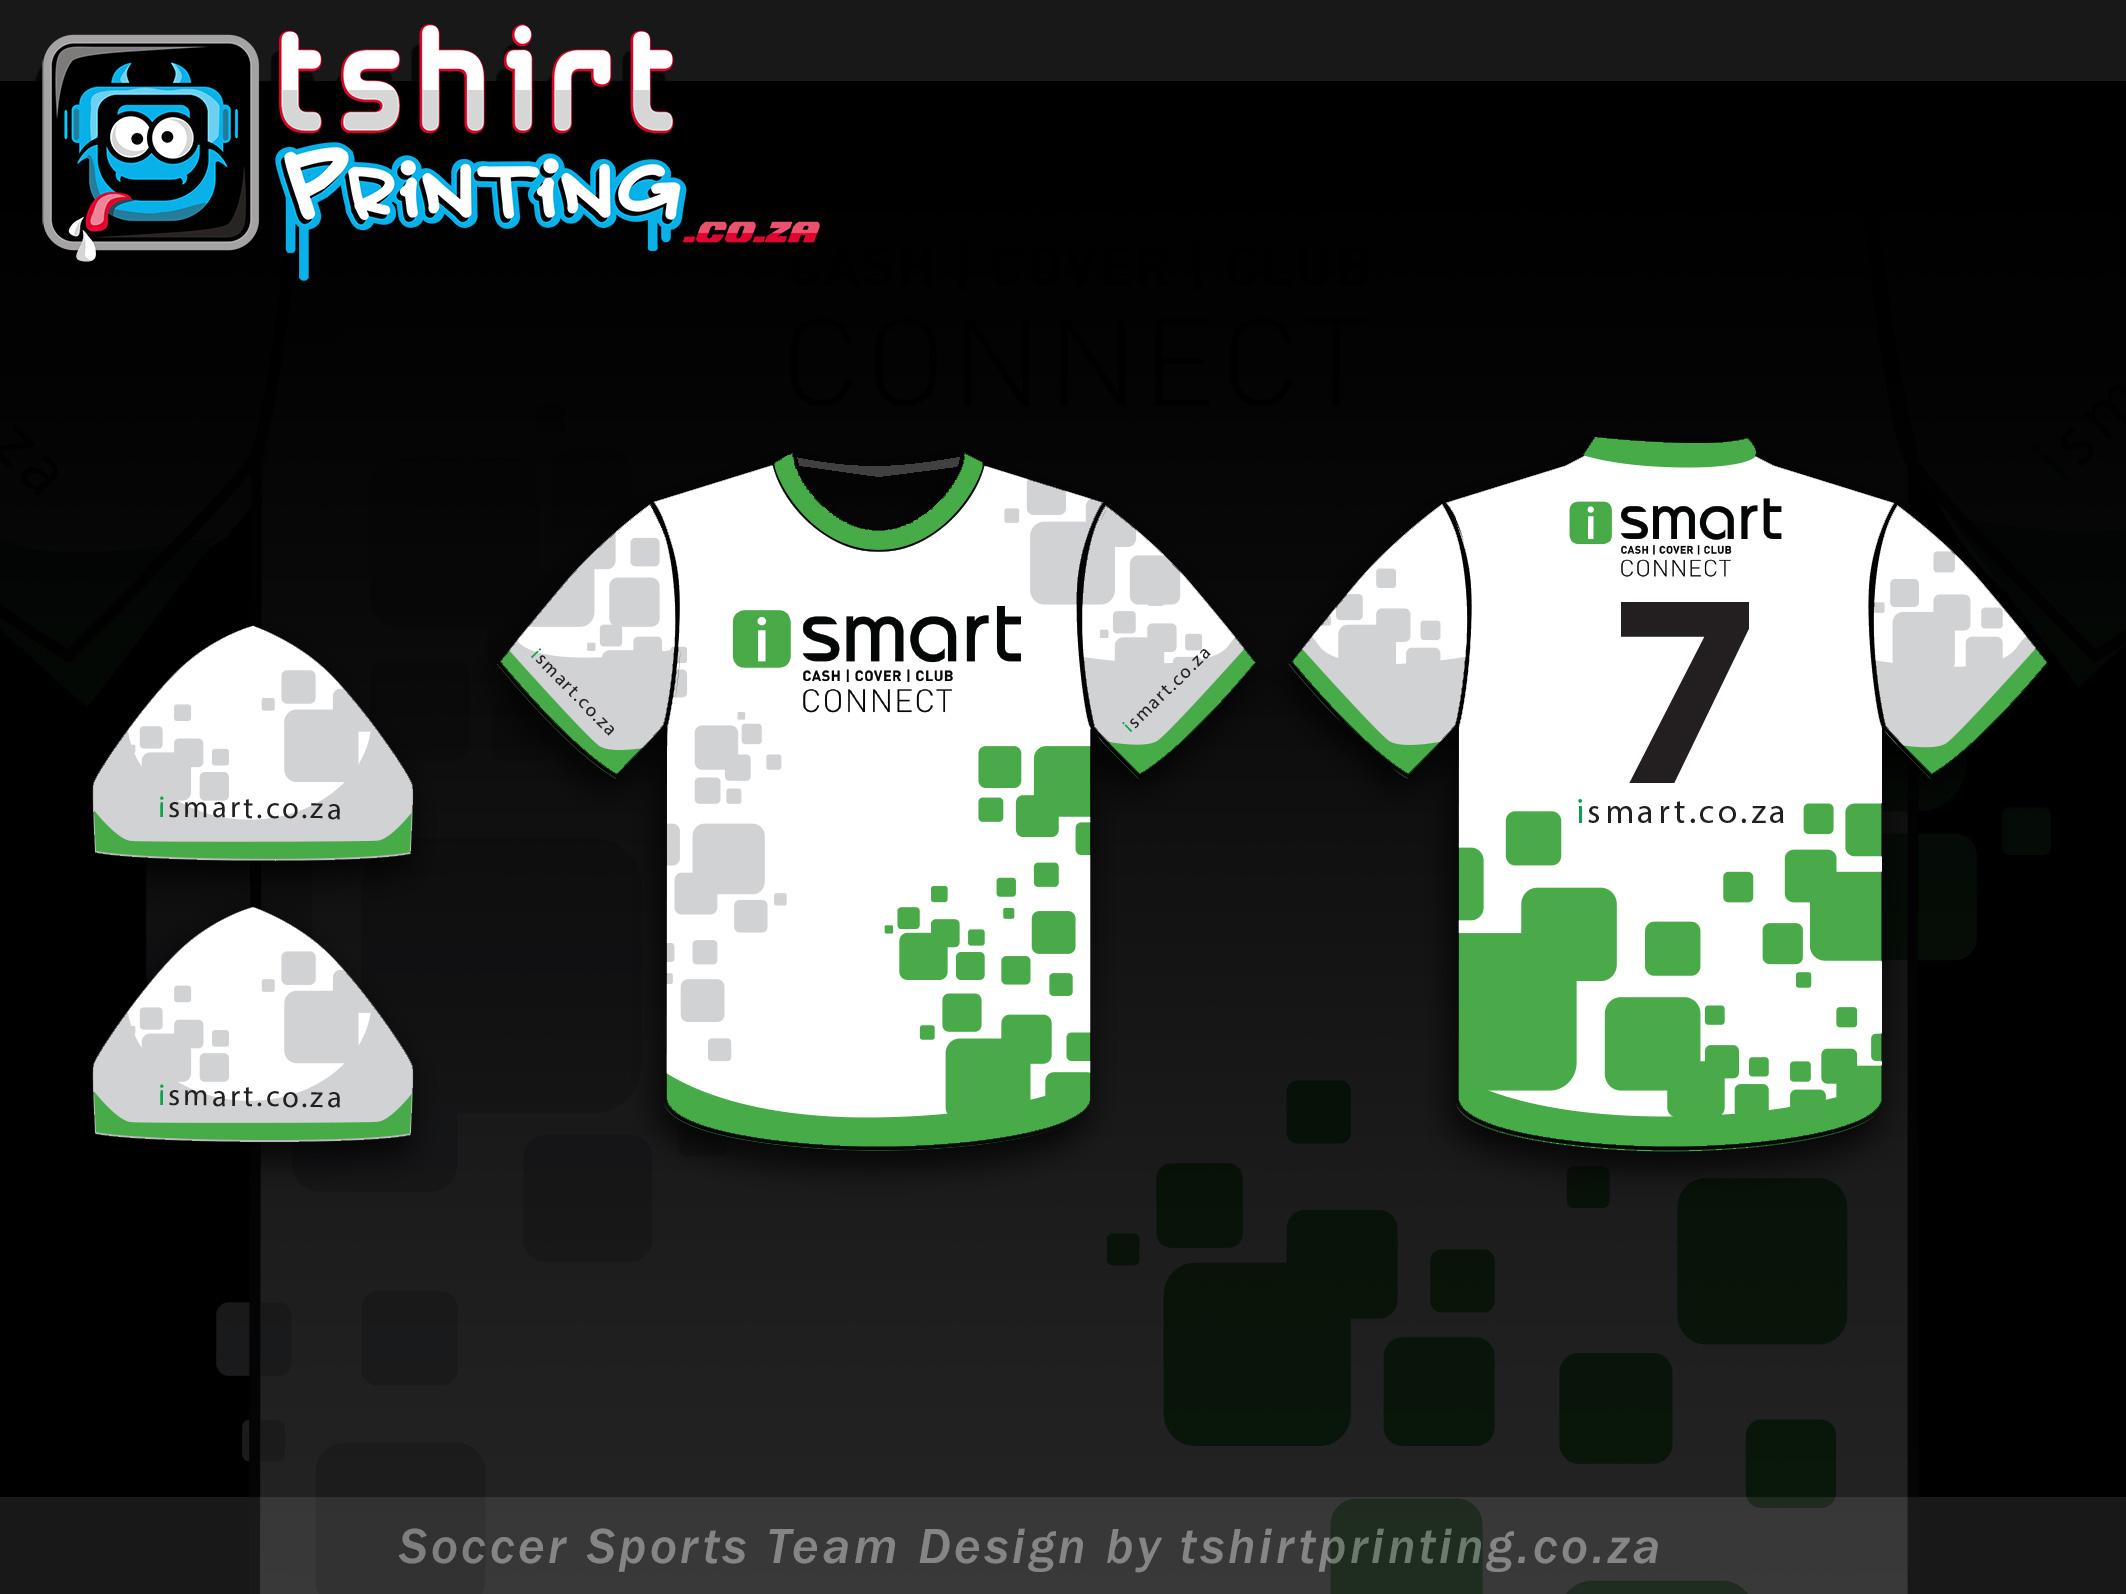 best soccer t shirt design ideas images home design ideas 2015 - Soccer T Shirt Design Ideas